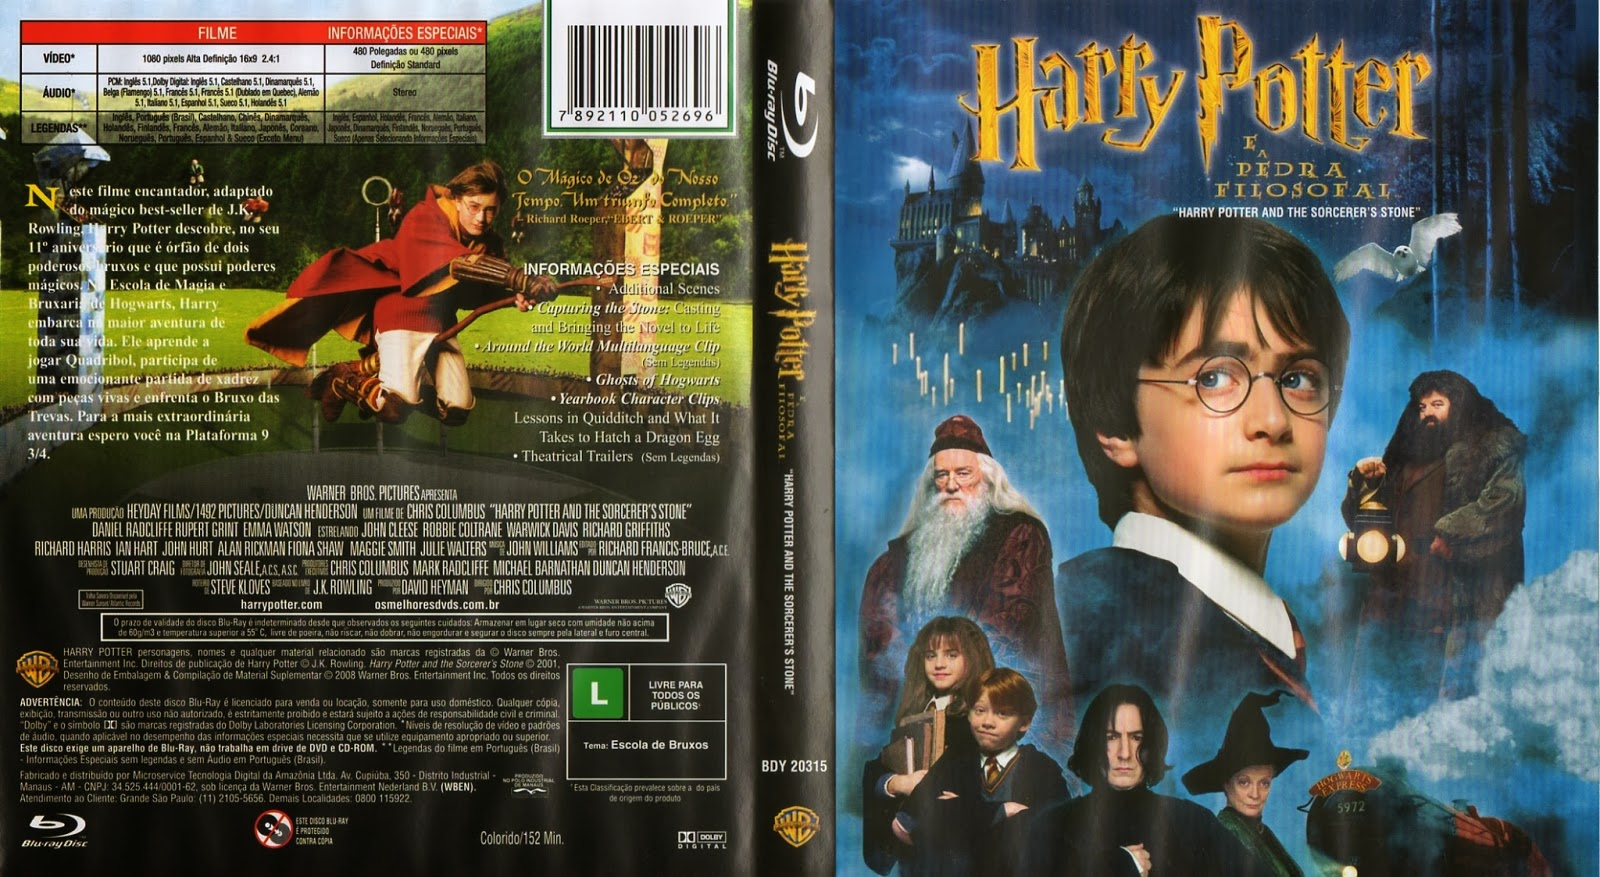 Harry Potter film series  Wikipedia